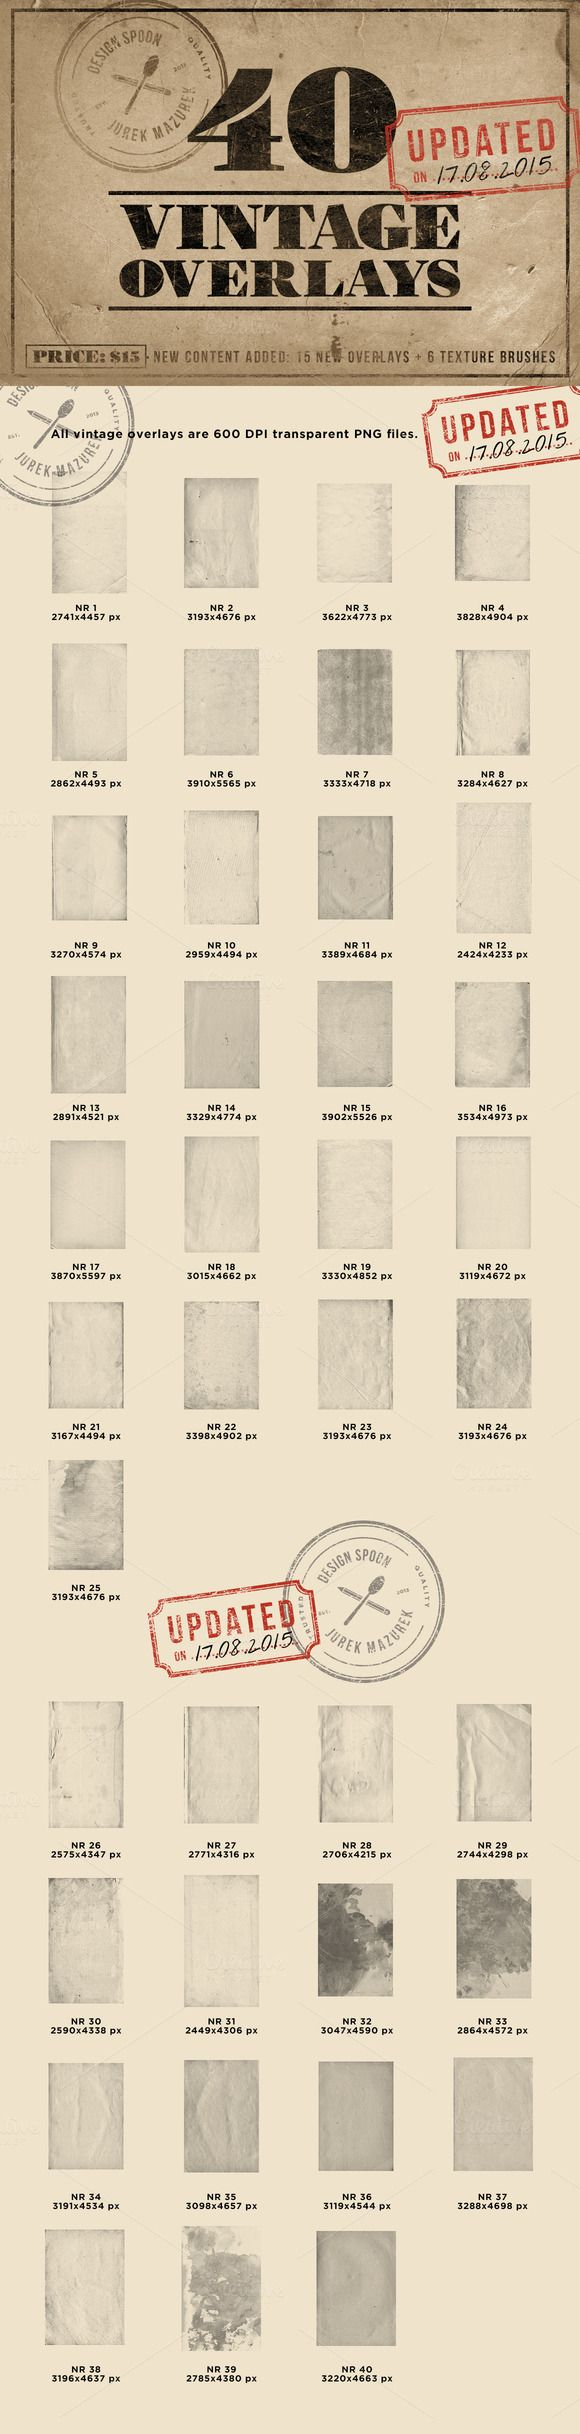 40 Vintage Overlays by Design Spoon on Creative Market